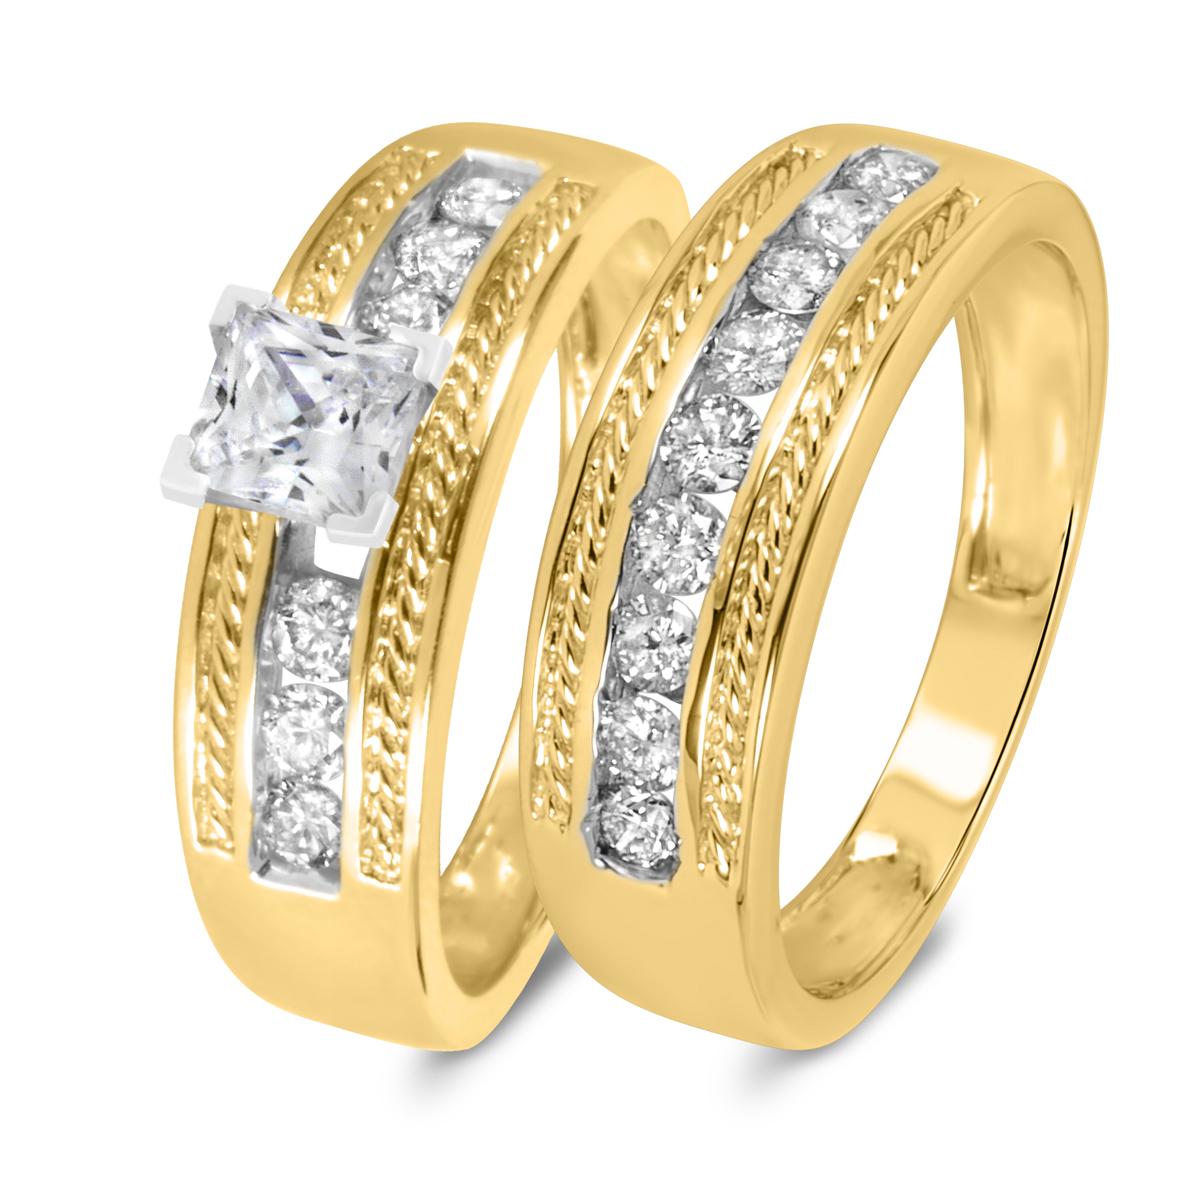 1 1/6 CT. T.W. Diamond Women's Bridal Wedding Ring Set 10K Yellow Gold